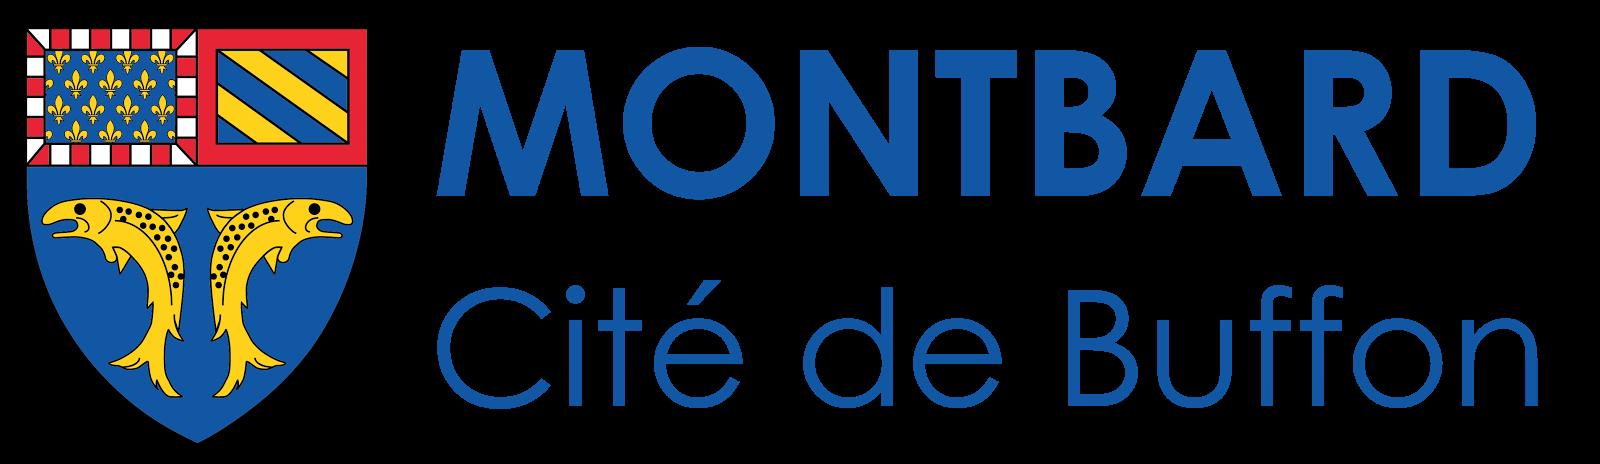 Ville de Montbard